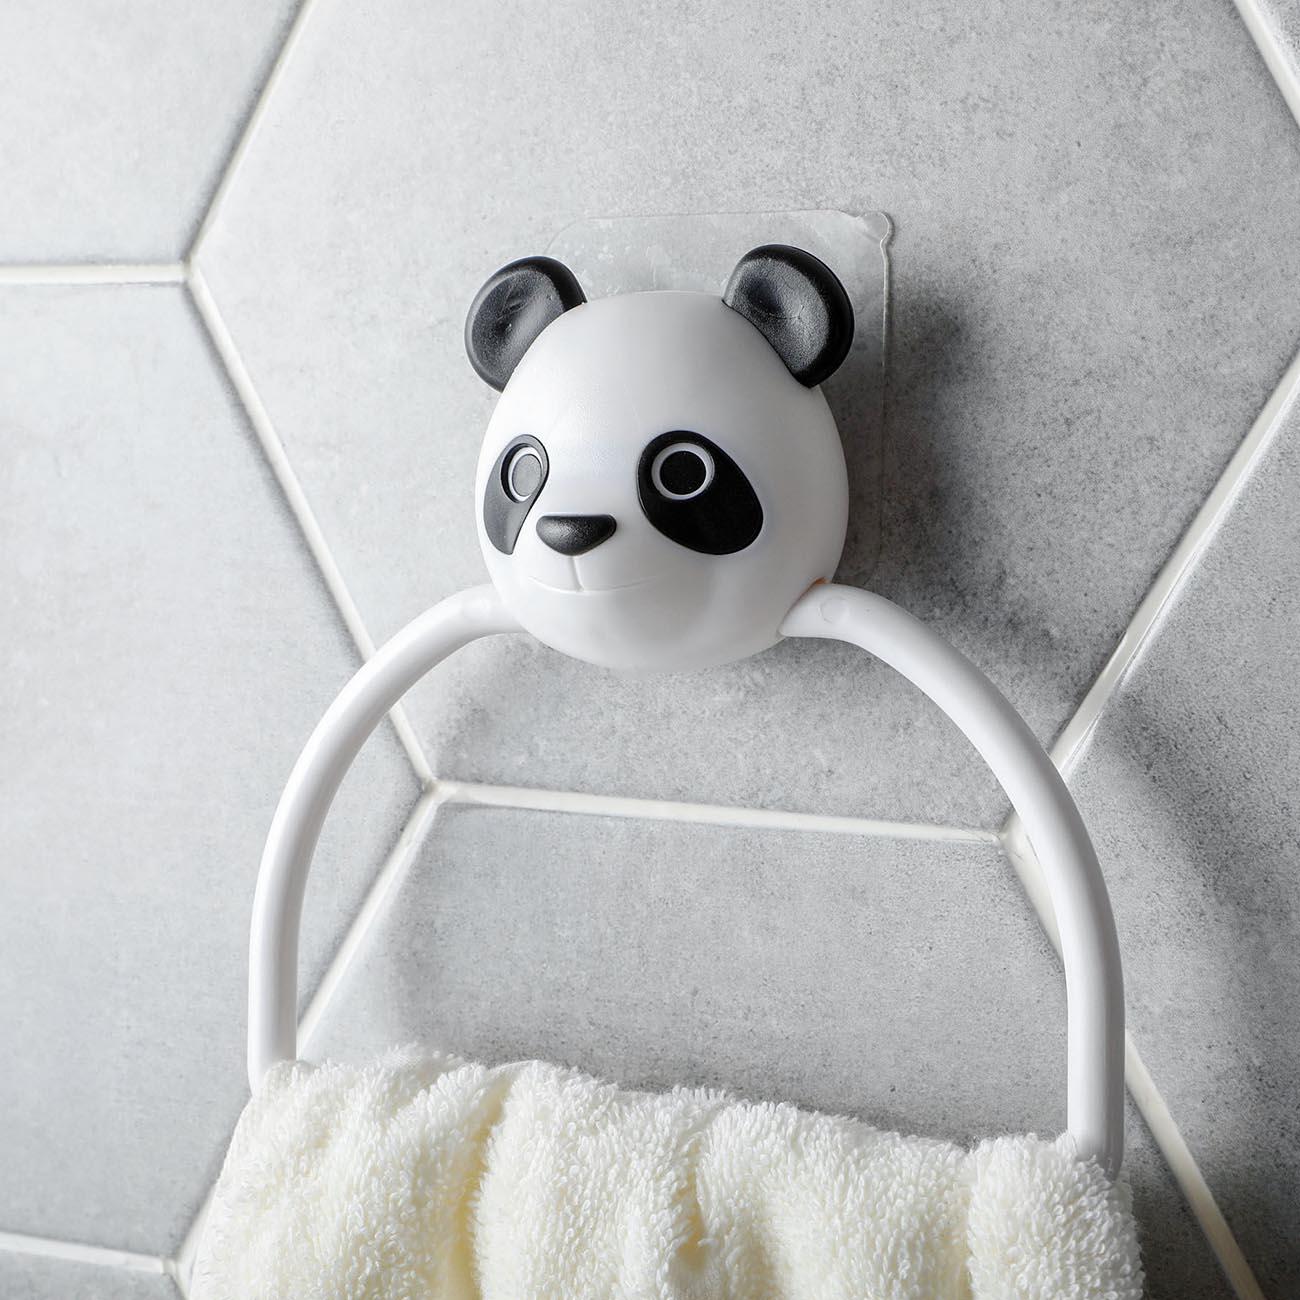 1pc Cartoon Towel Holder Rack Bathroom Organizer Hanging Towel Bar Bathroom Storage Rack Self Hanger Plastic Towel Ring